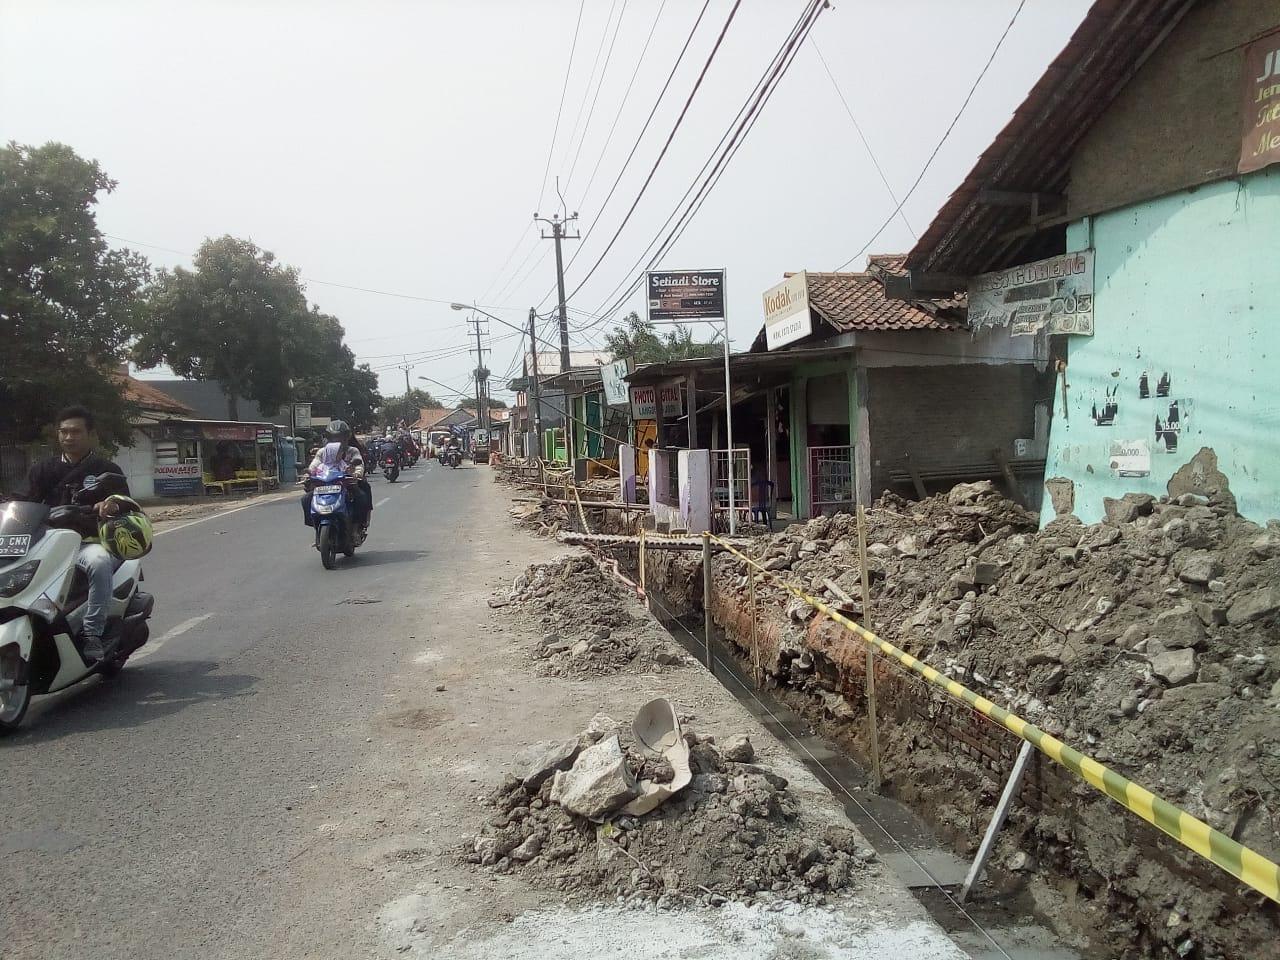 Masyarakat Kelurahan Pakuhaji Sambut Baik Proyek Peningkatan Jalan Gardu-Tanah Merah